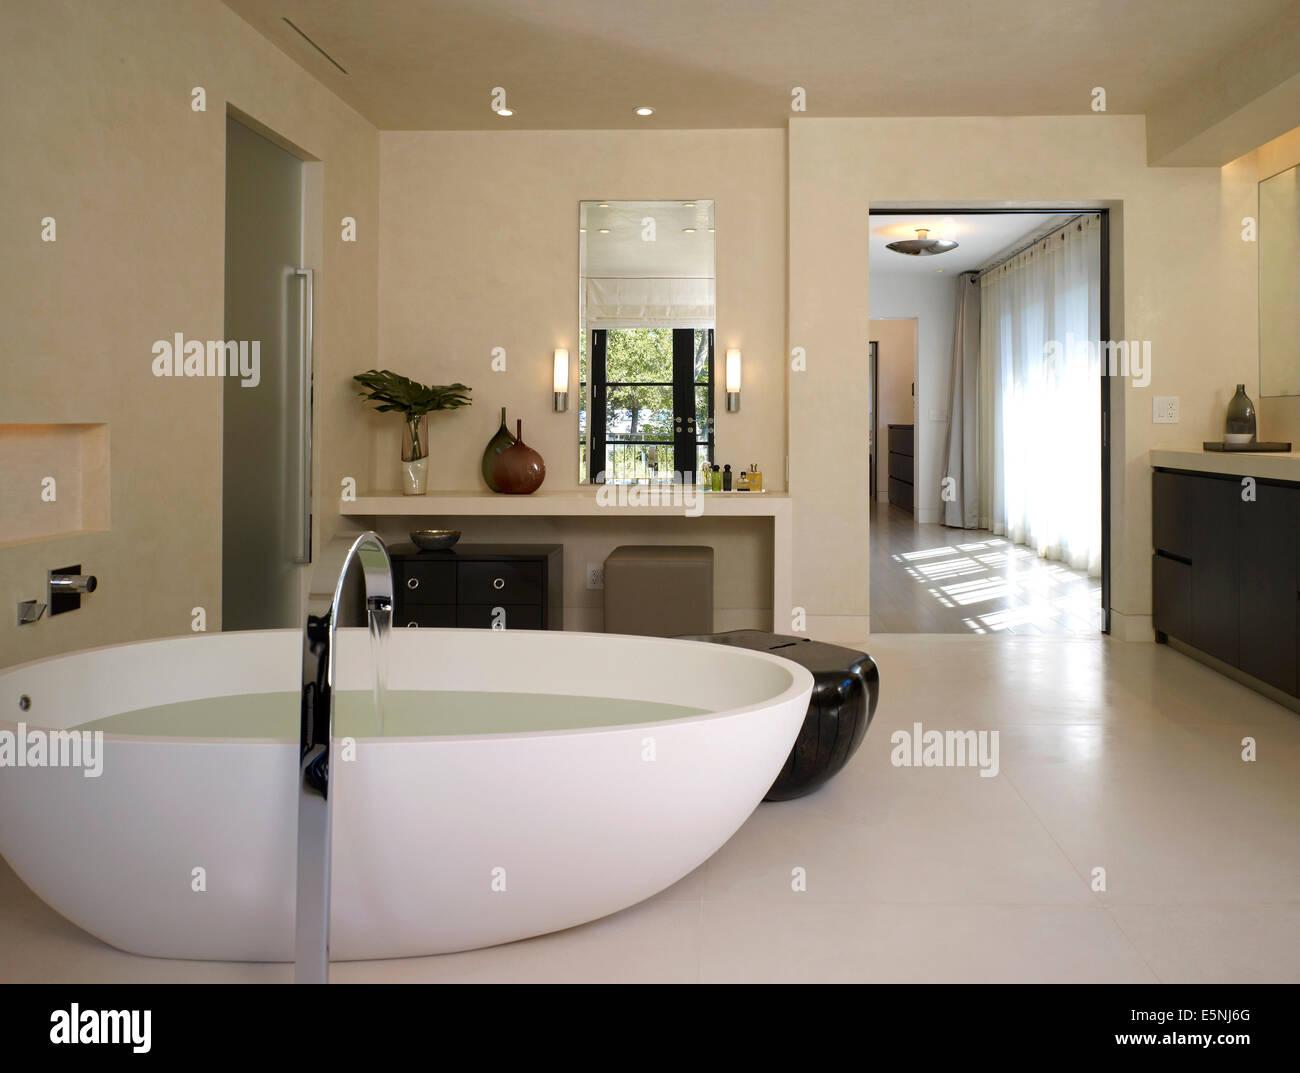 Freestanding modern bath in Stone House, Atherton, California, USA ...